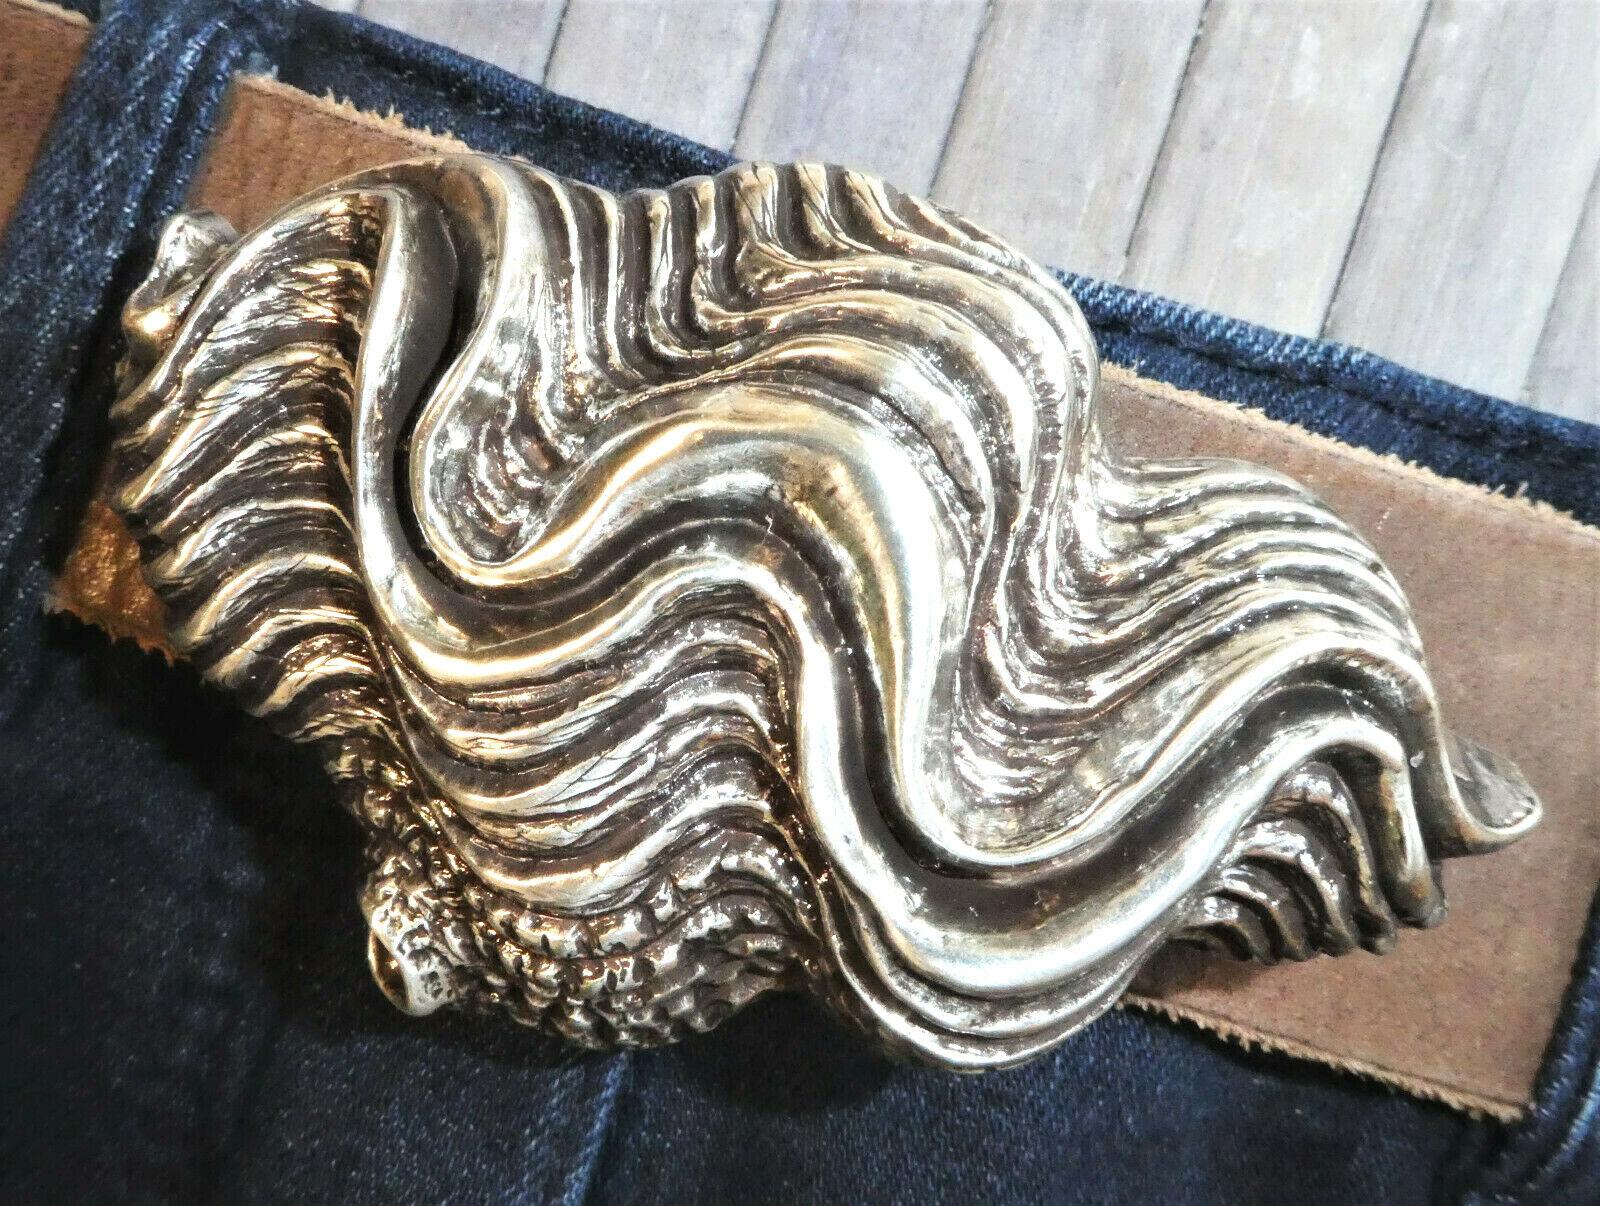 Muschel / Welle / Maritim Gürtelschnalle Wechselschnalle Buckle 4 cm